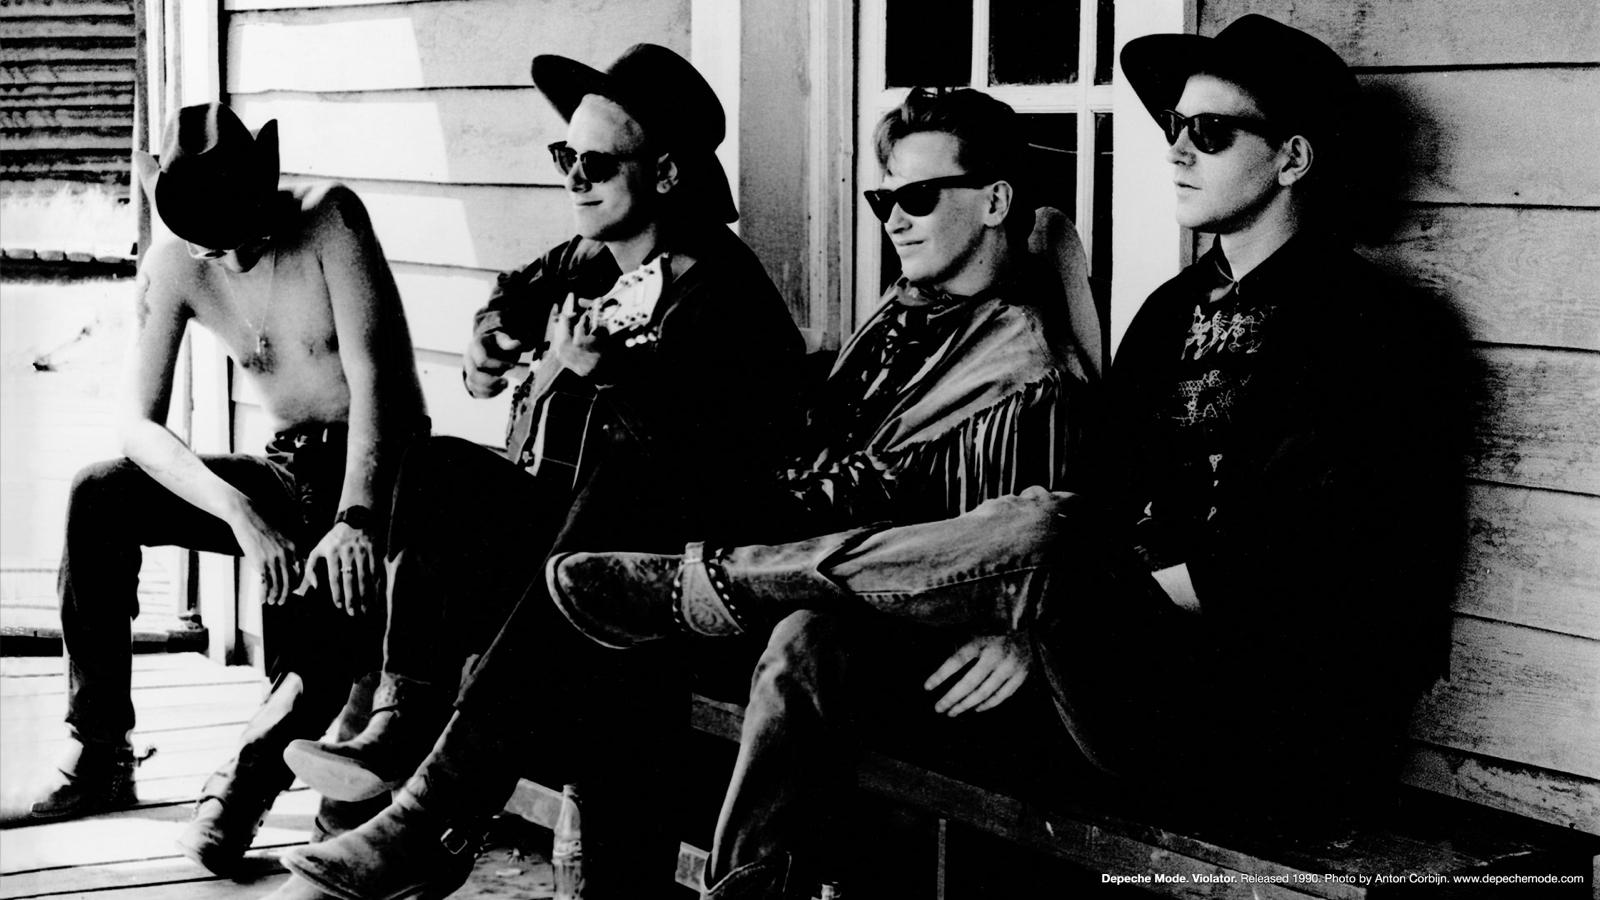 Depeche Mode Portrait 1990